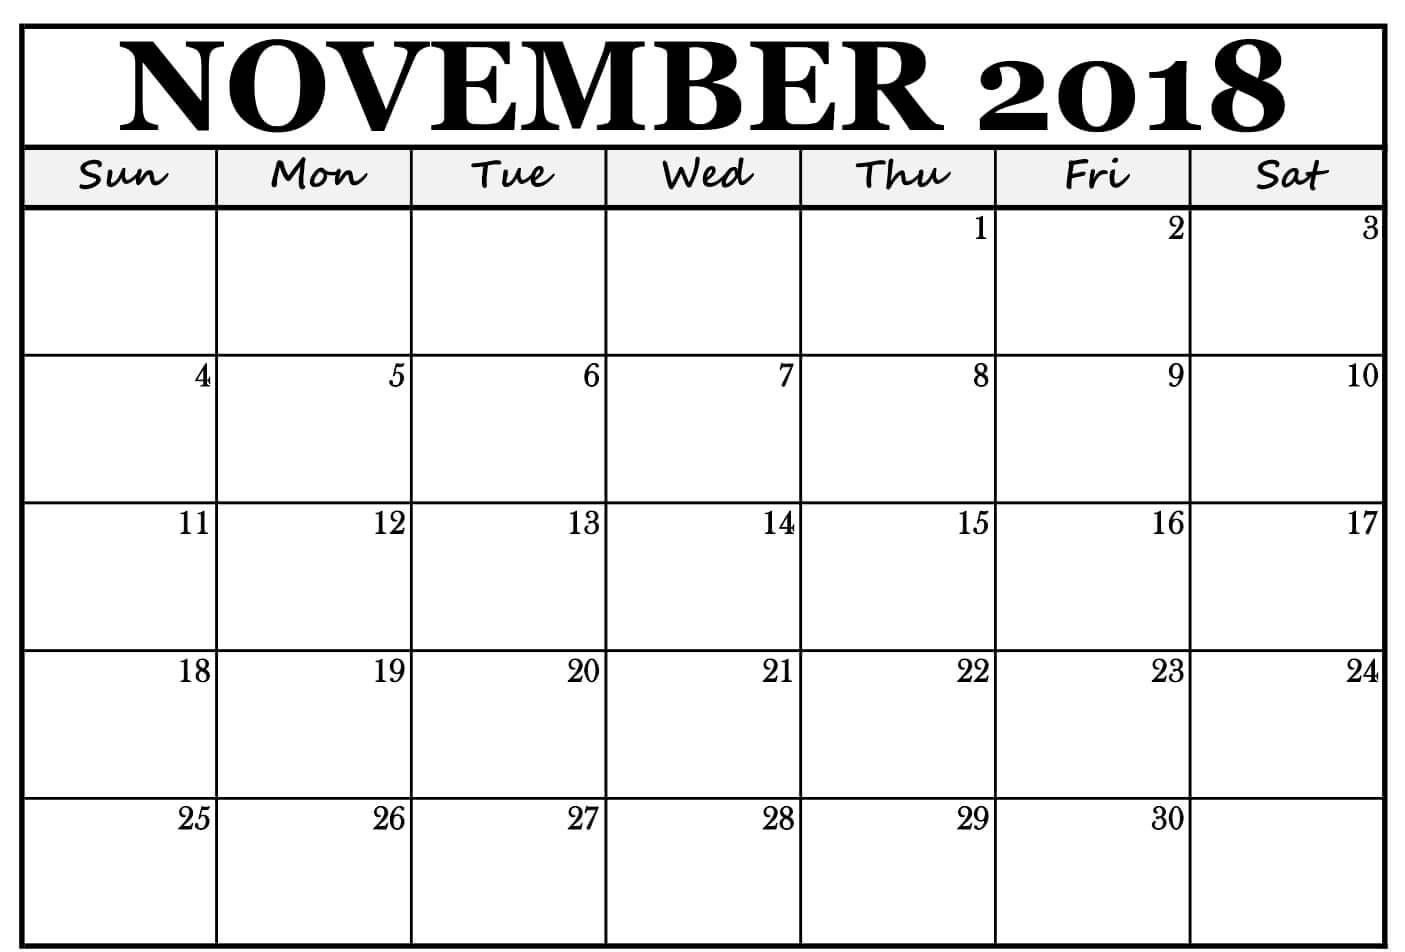 November 2018 Calendar Excel Template